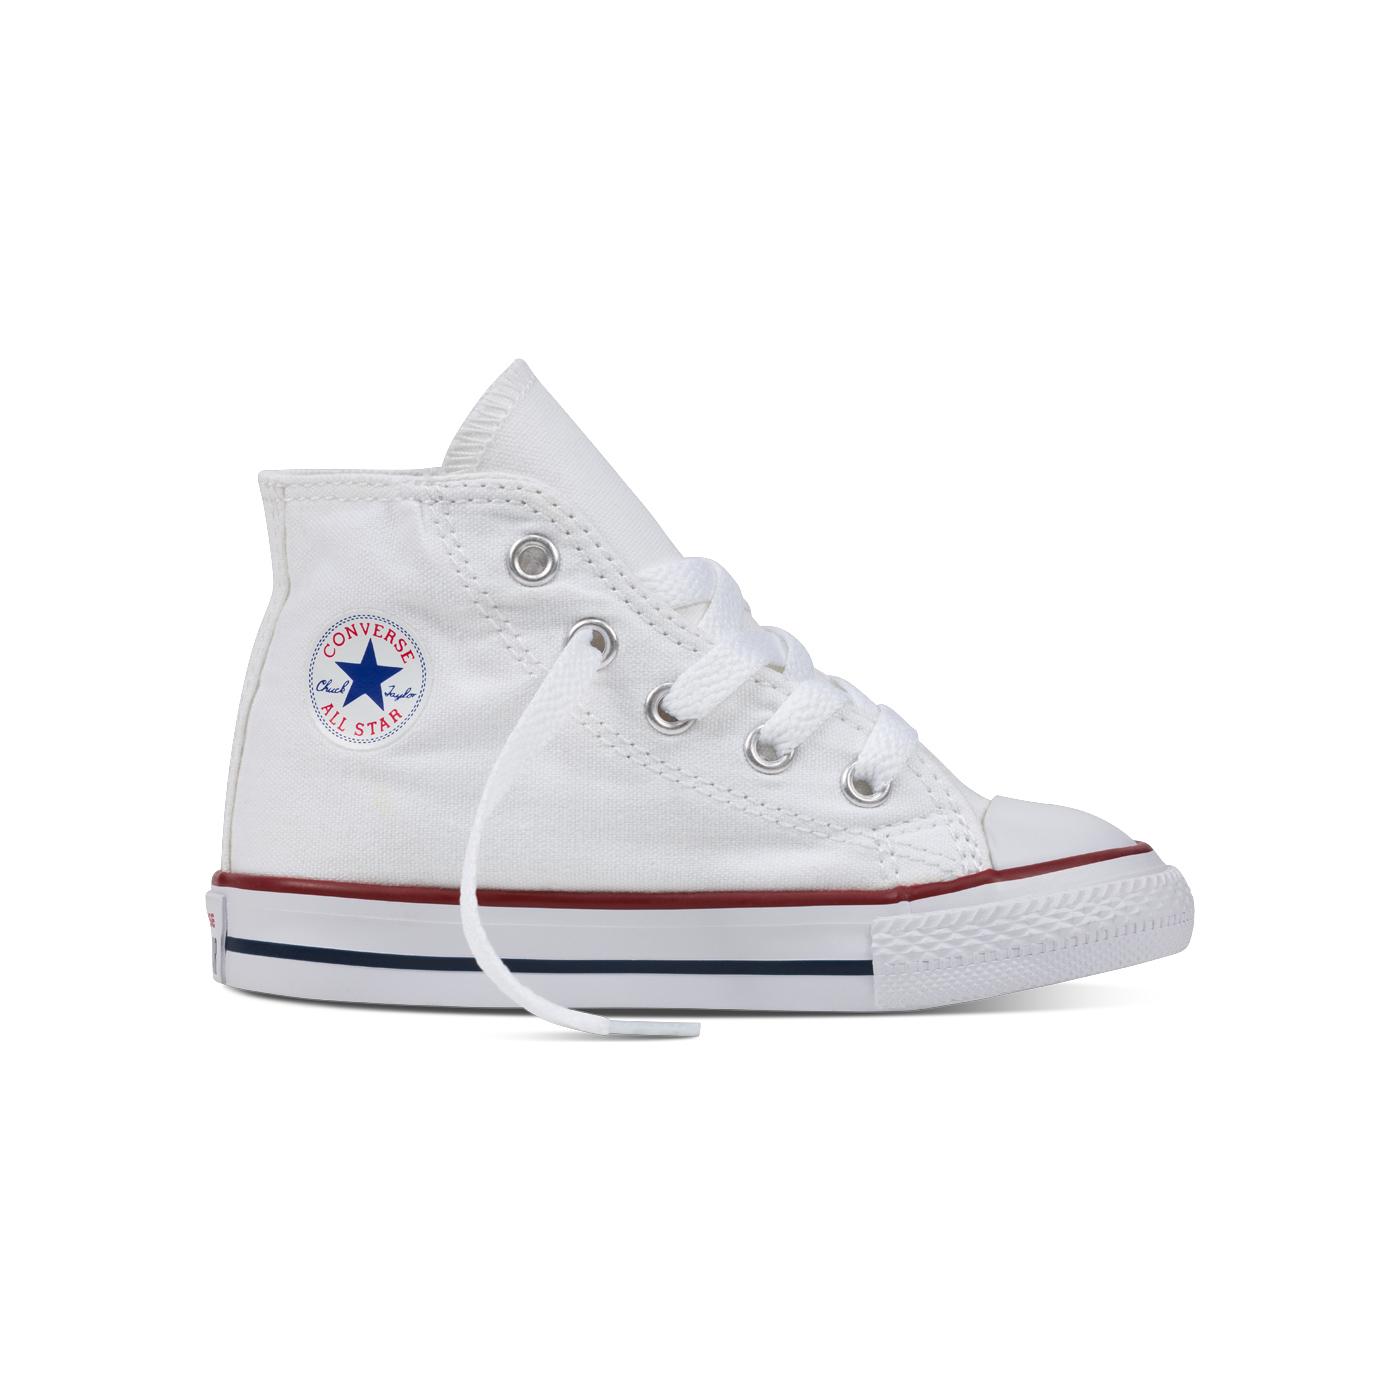 All Star תינוקות // לבנות גבוהות